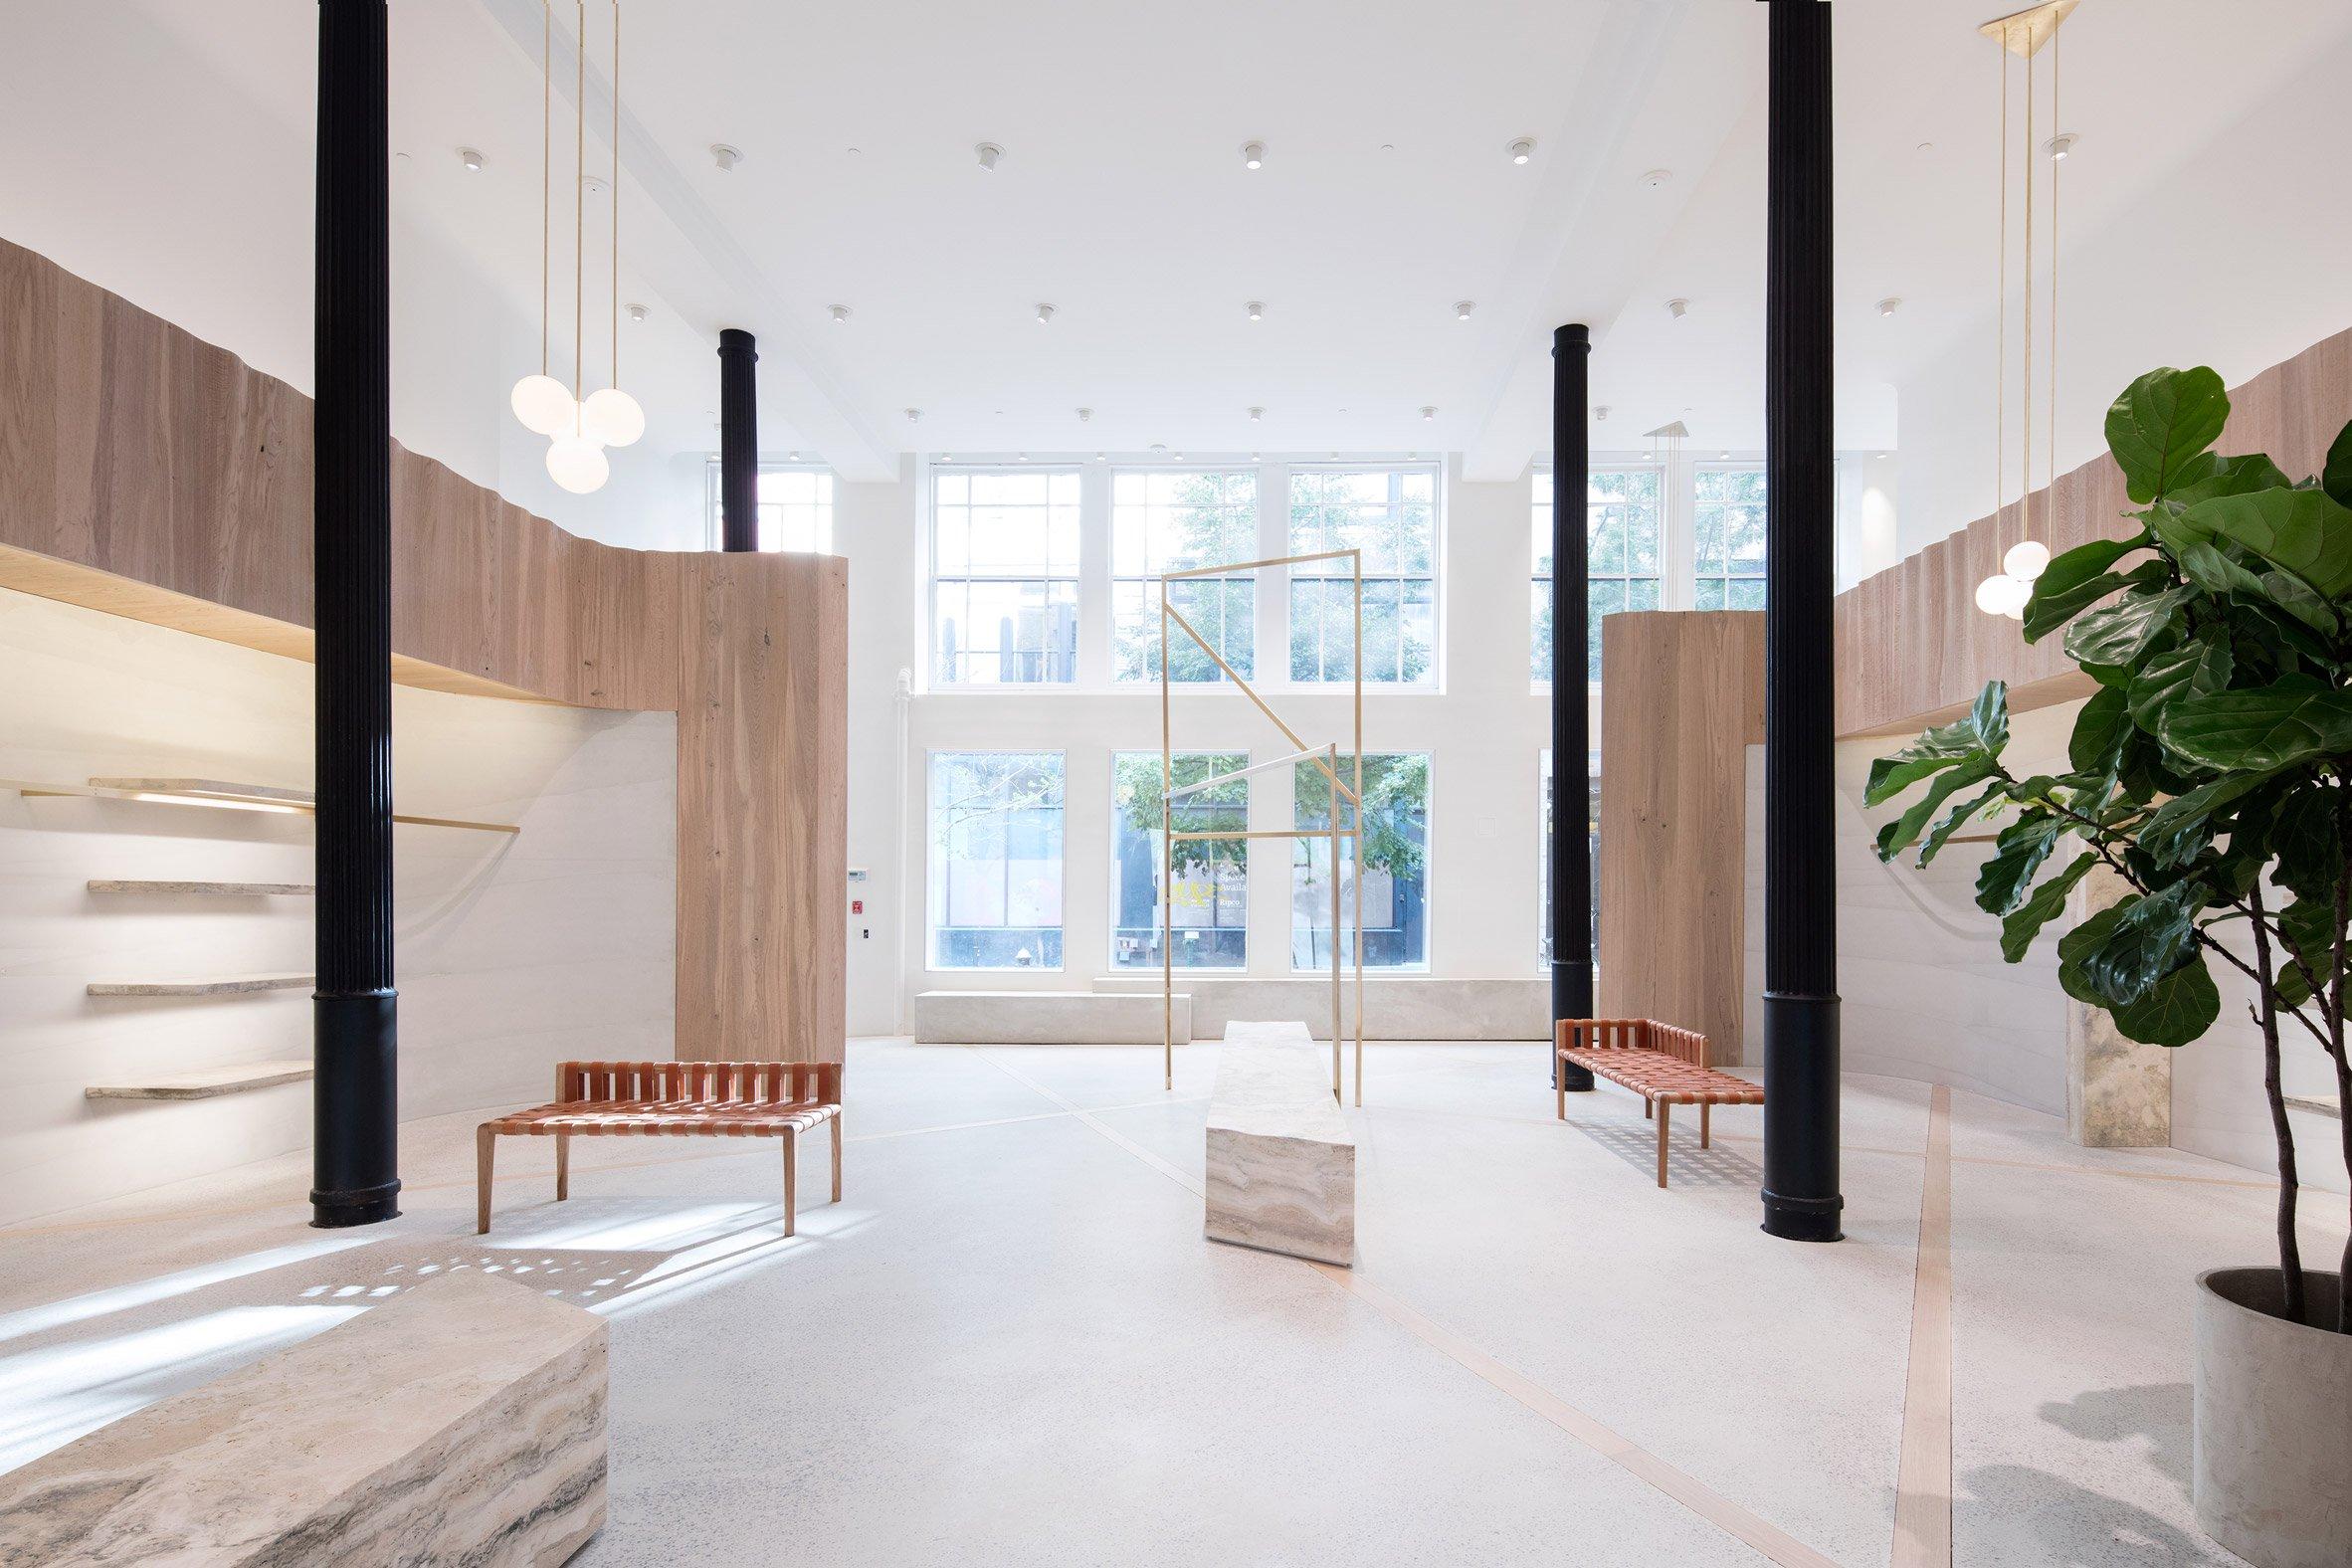 thakoon-ny-avra-madison-fashion-retail-store-shop-interior-design-fernando-mastrangelo-new-york-city-usa_dezeen_2364_col_19